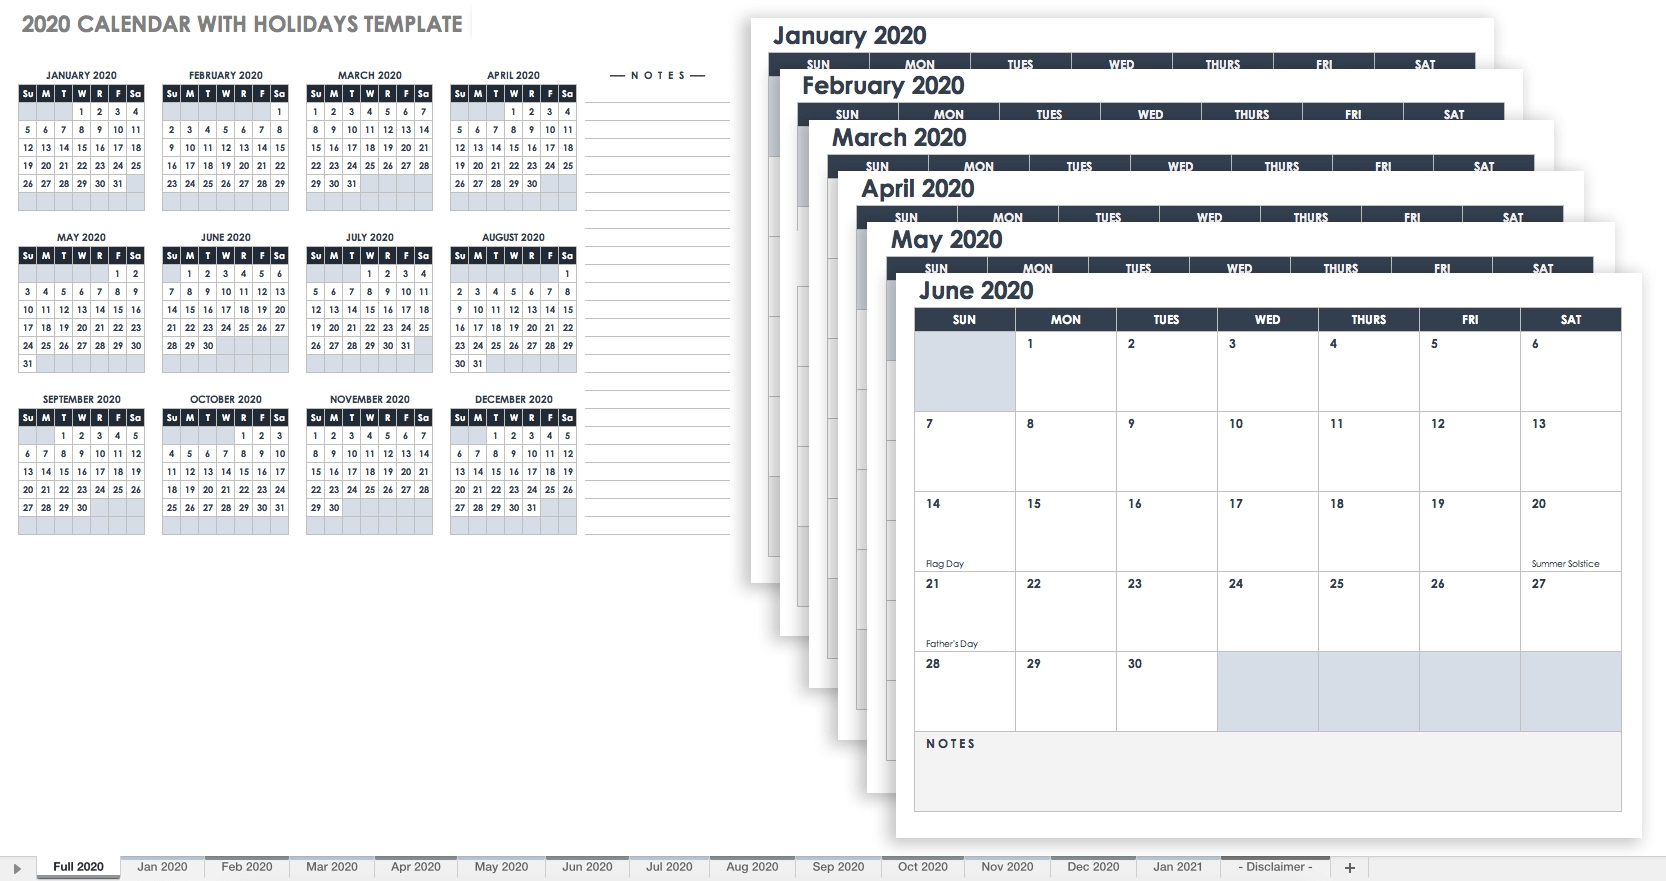 Free Google Calendar Templates | Smartsheet intended for 2020 Google Sheets Calendar